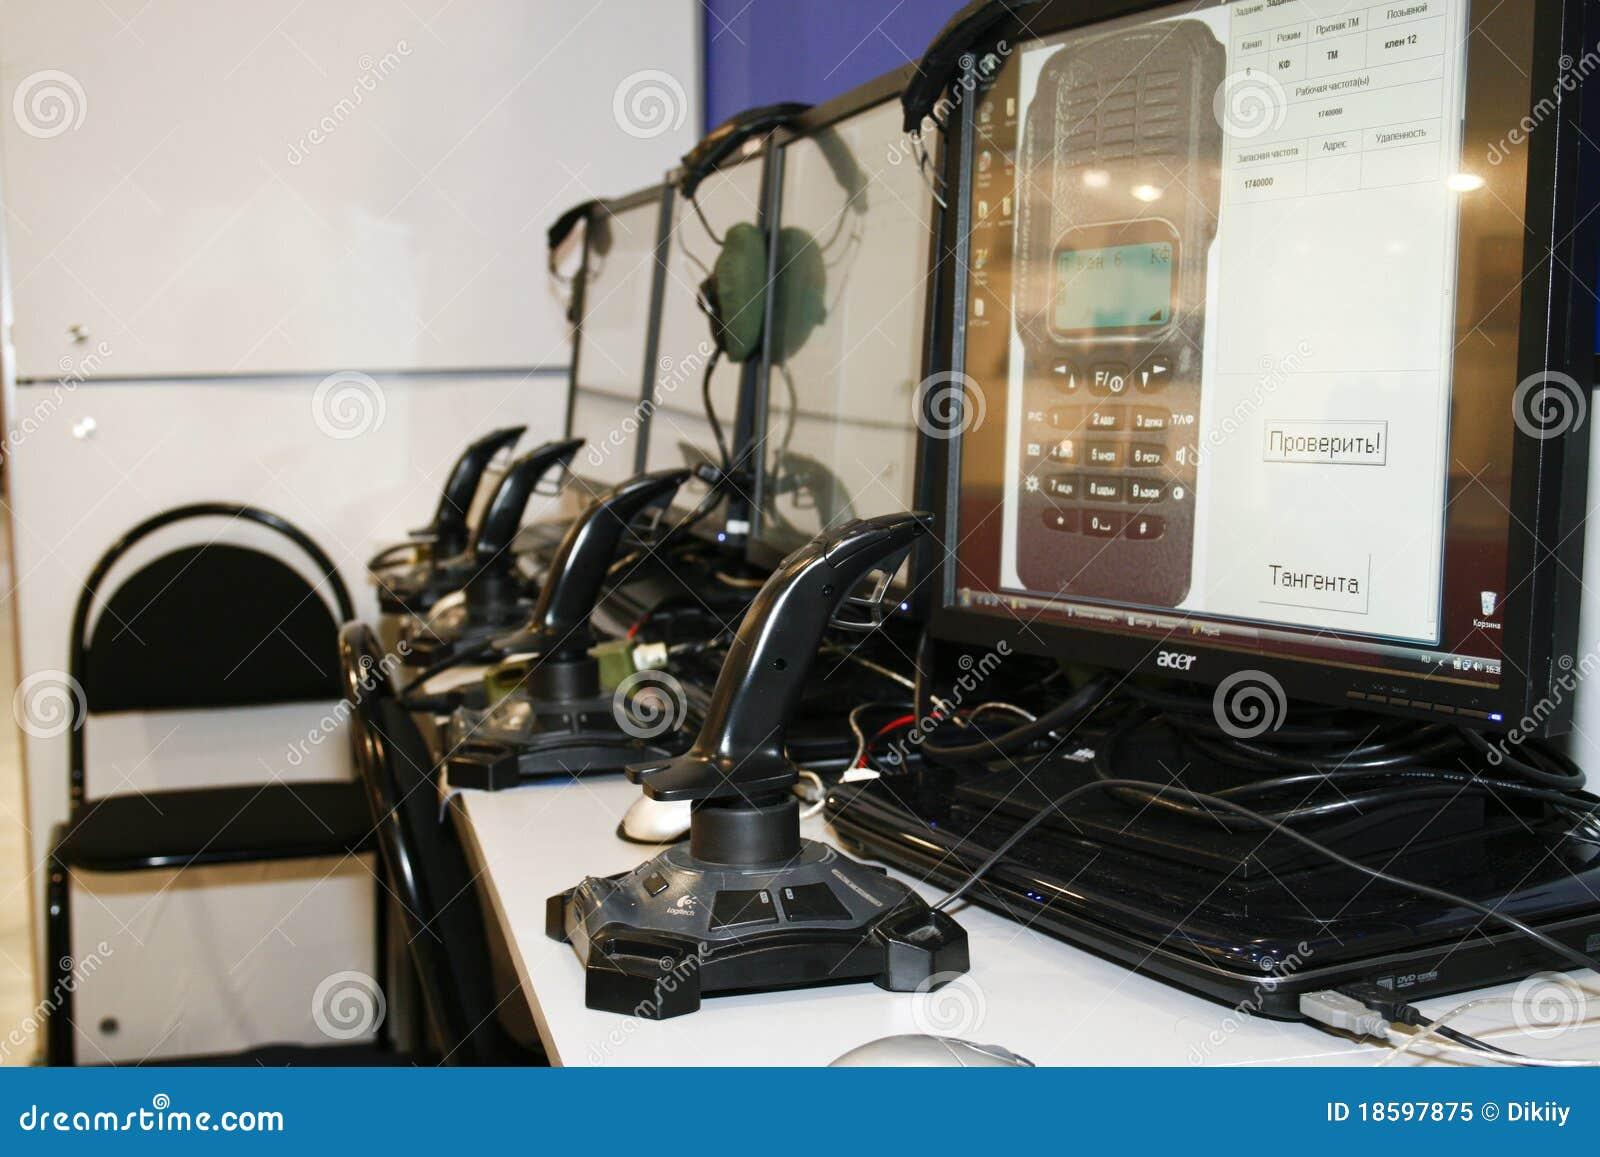 Radio Murmansk - A Year In Progress